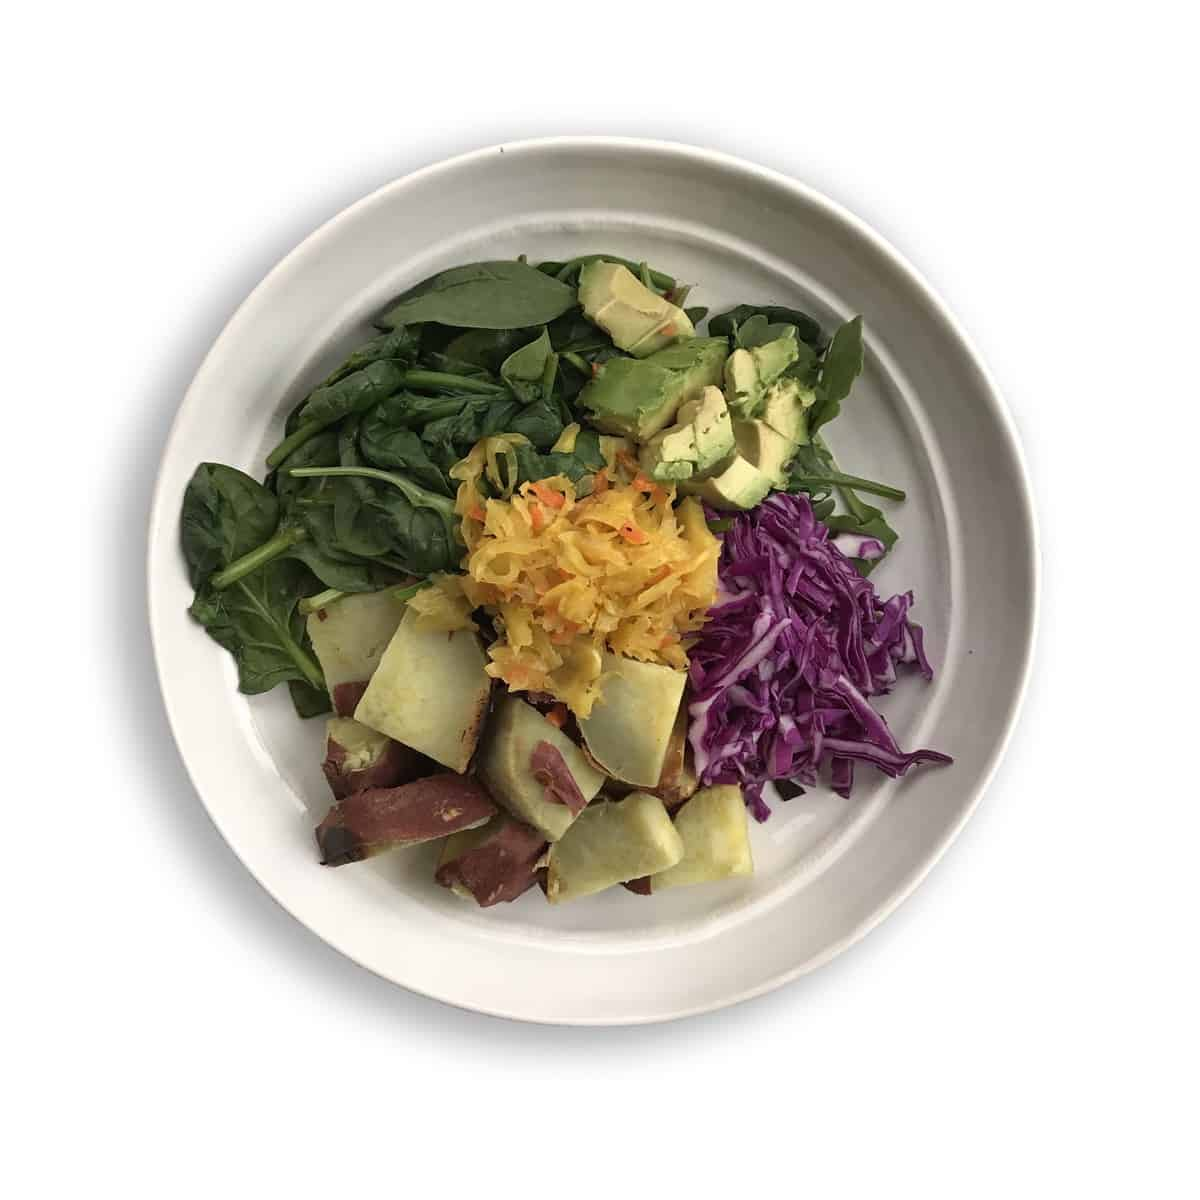 Rainbow Breakfast Bowl - Chef Whitney Aronoff | Starseed Kitchen